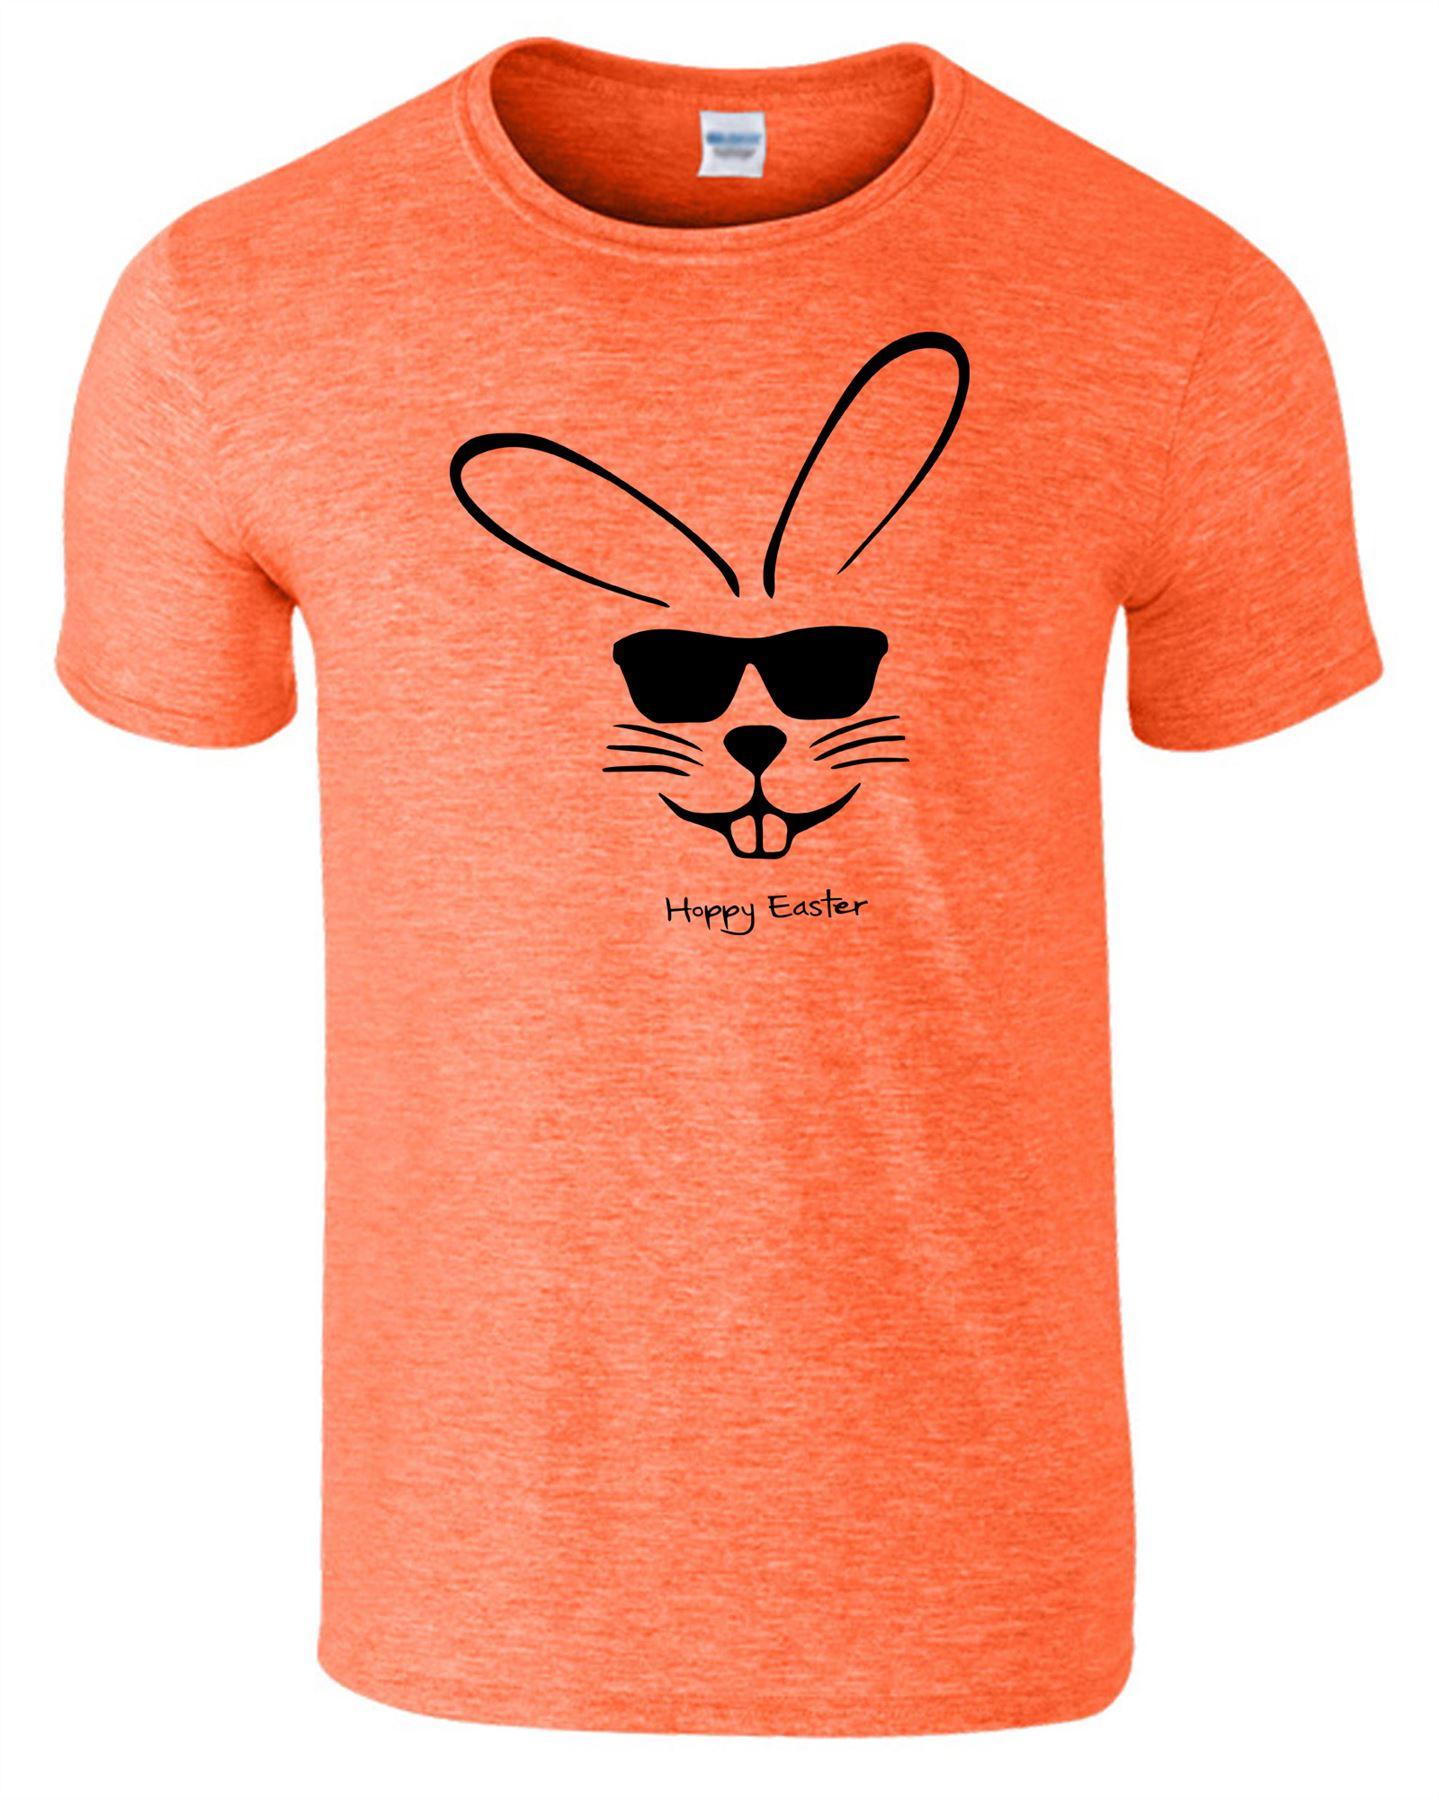 Easter Bunny Mens T-Shirt Cool Rabbit Funny Novelty Xmas Gift Unisex Tshirt